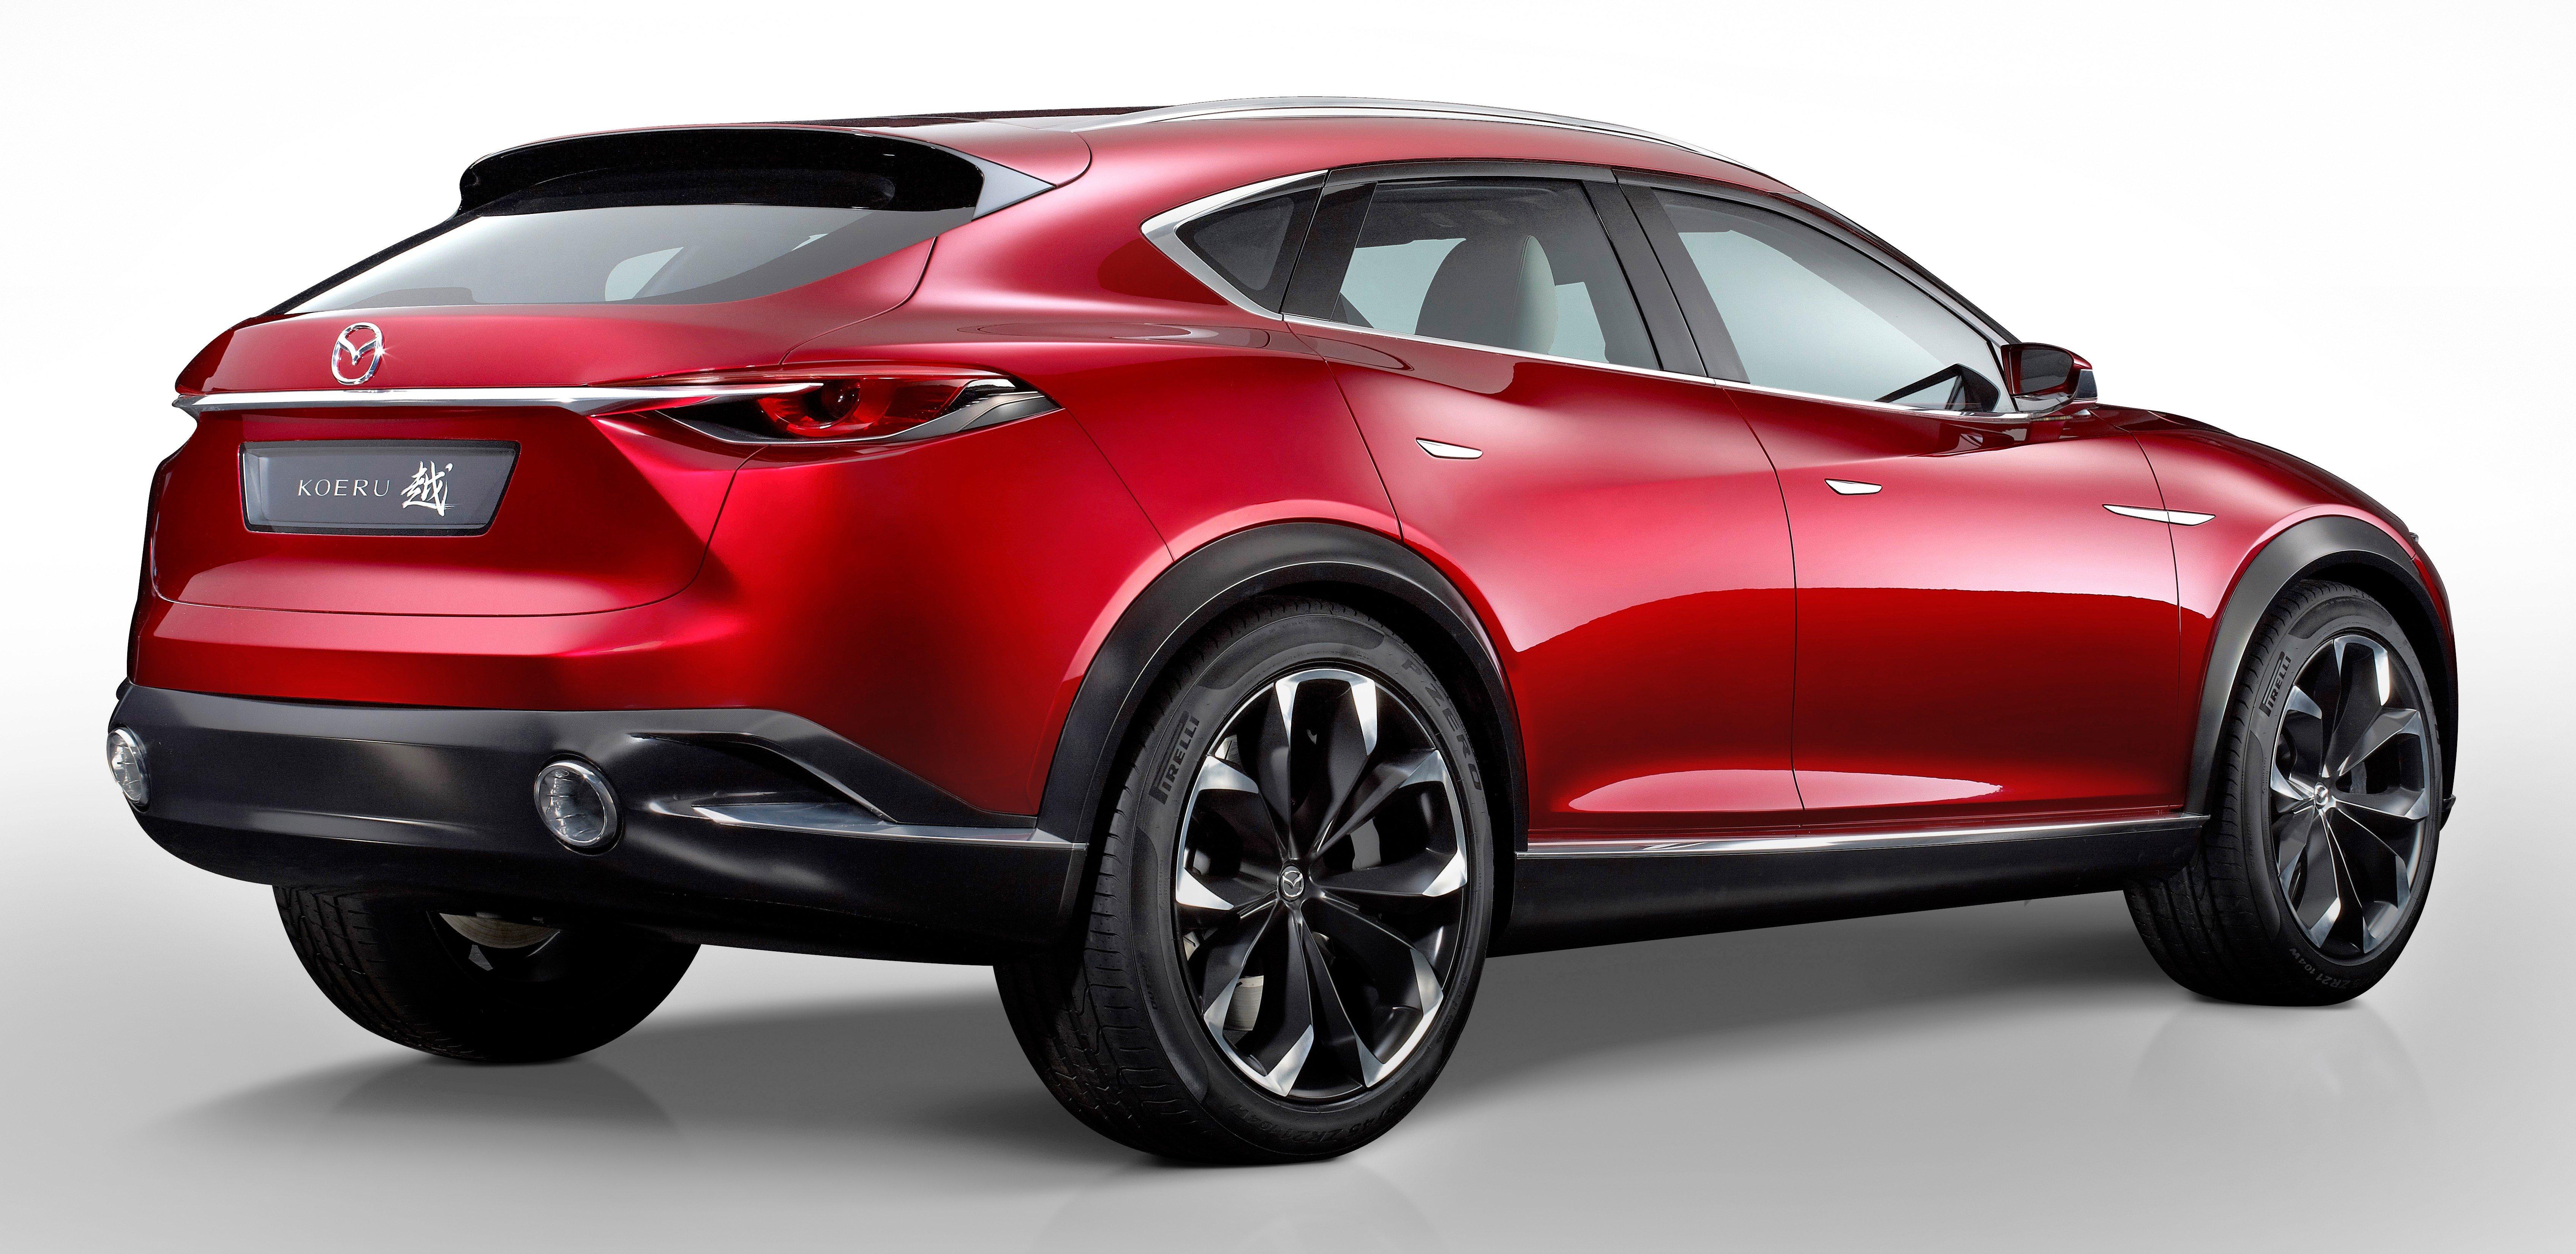 Mazda Koeru concept previews a sportier CX-5 SUV? Paul Tan ...